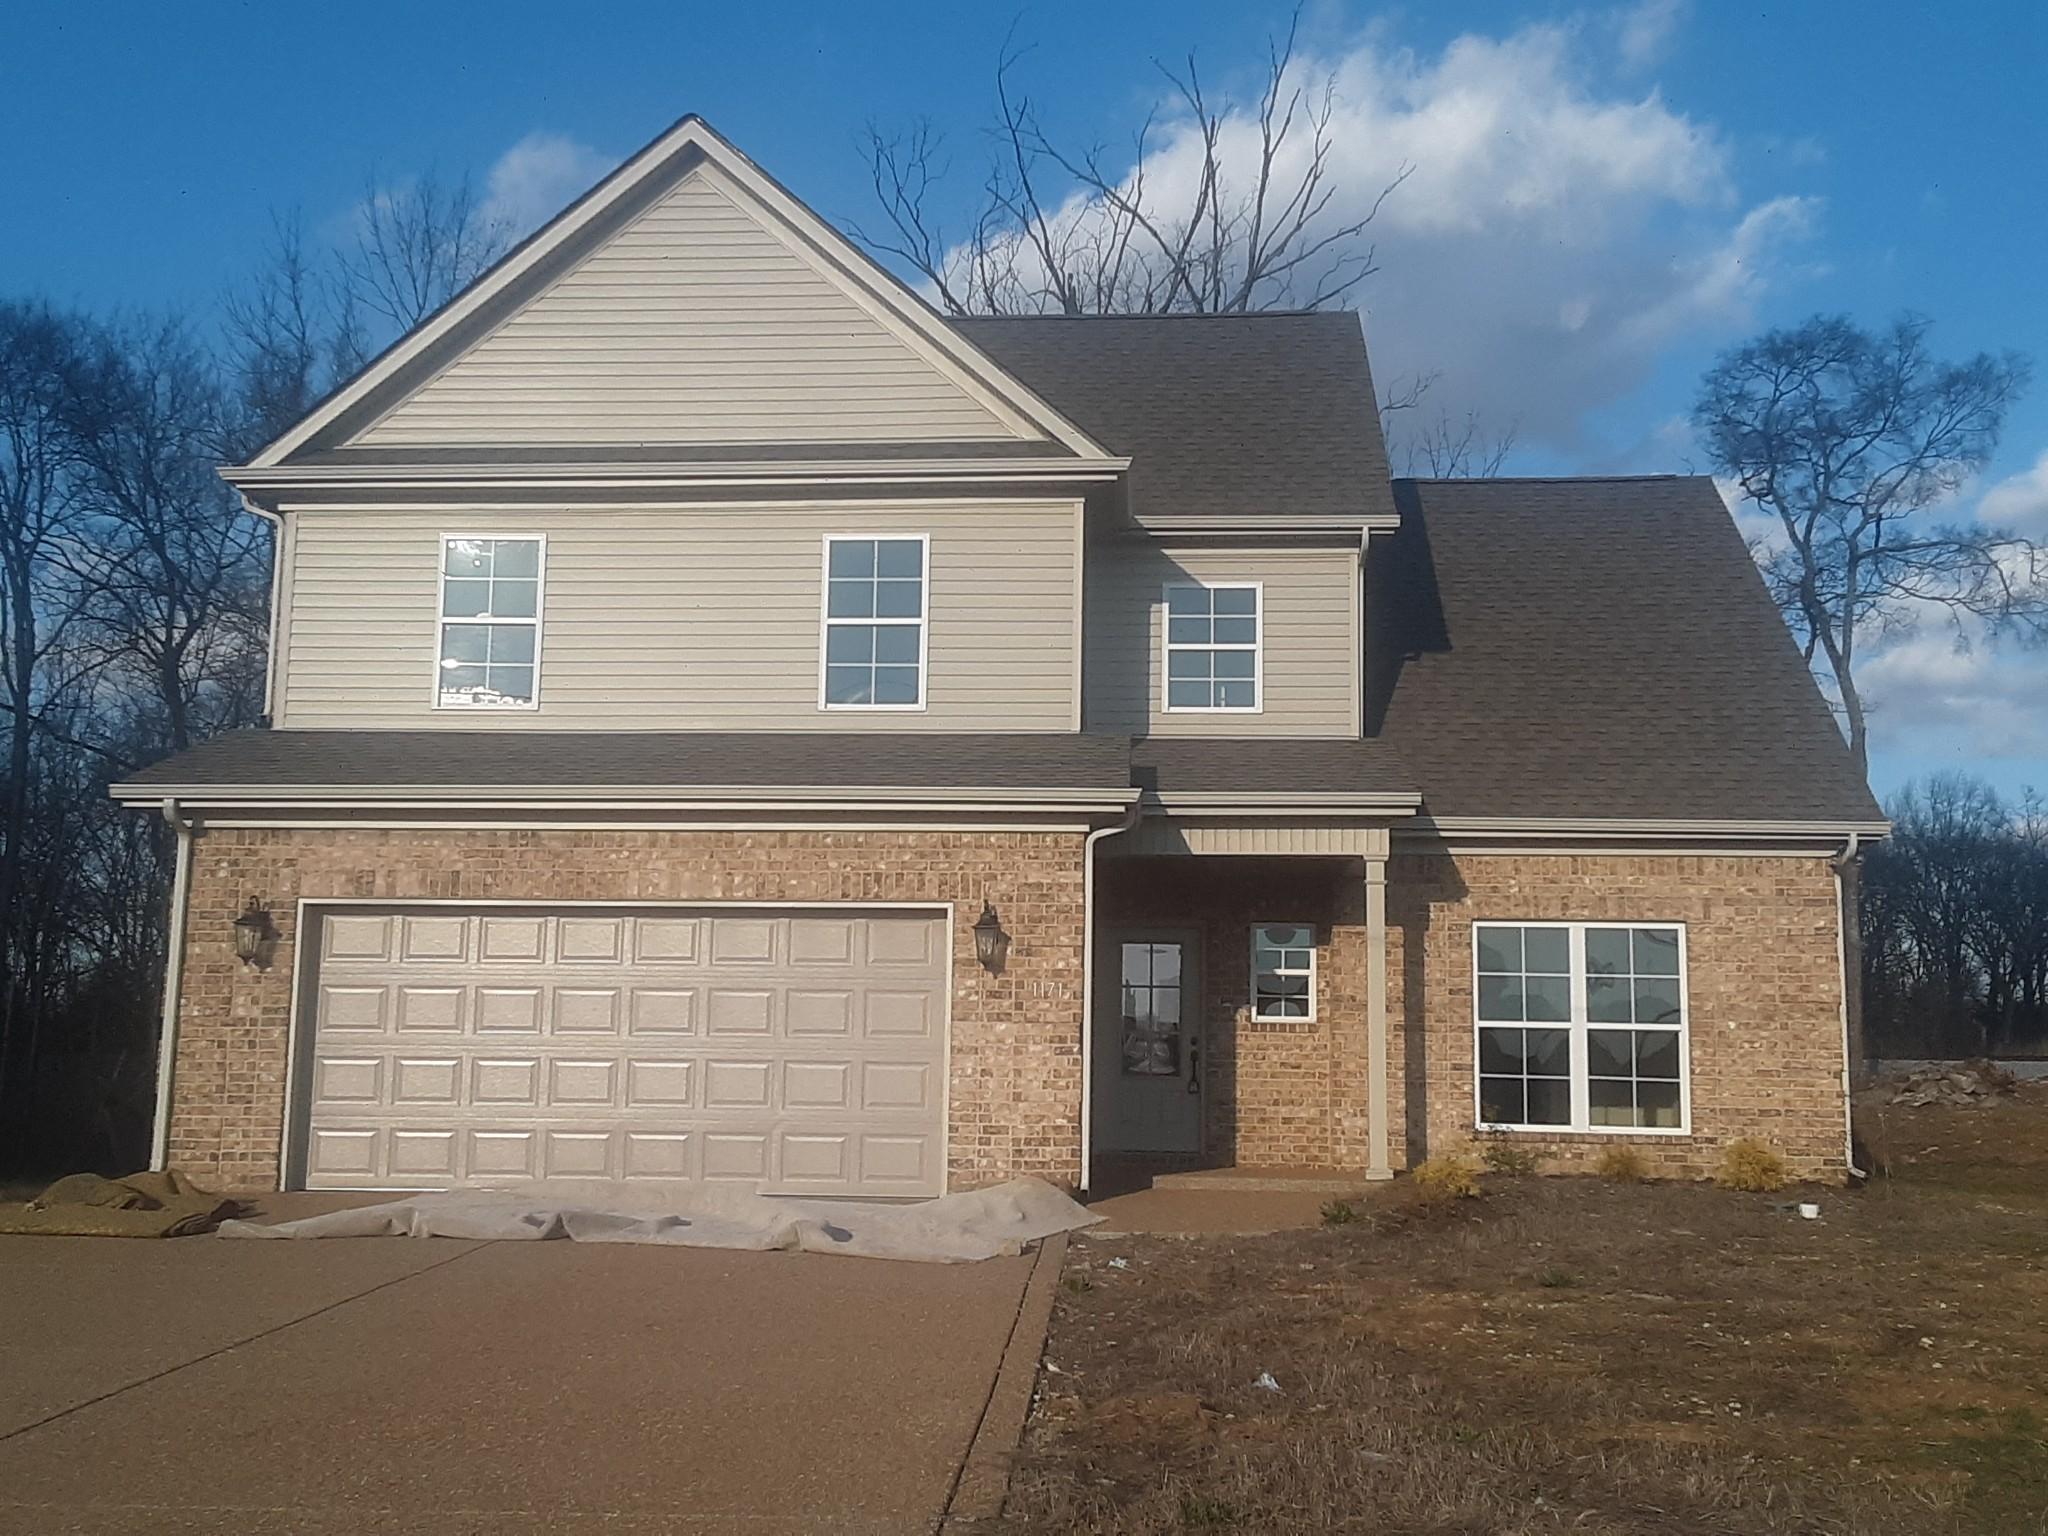 1171 Rimrock Rd, Smyrna, TN 37167 - Smyrna, TN real estate listing